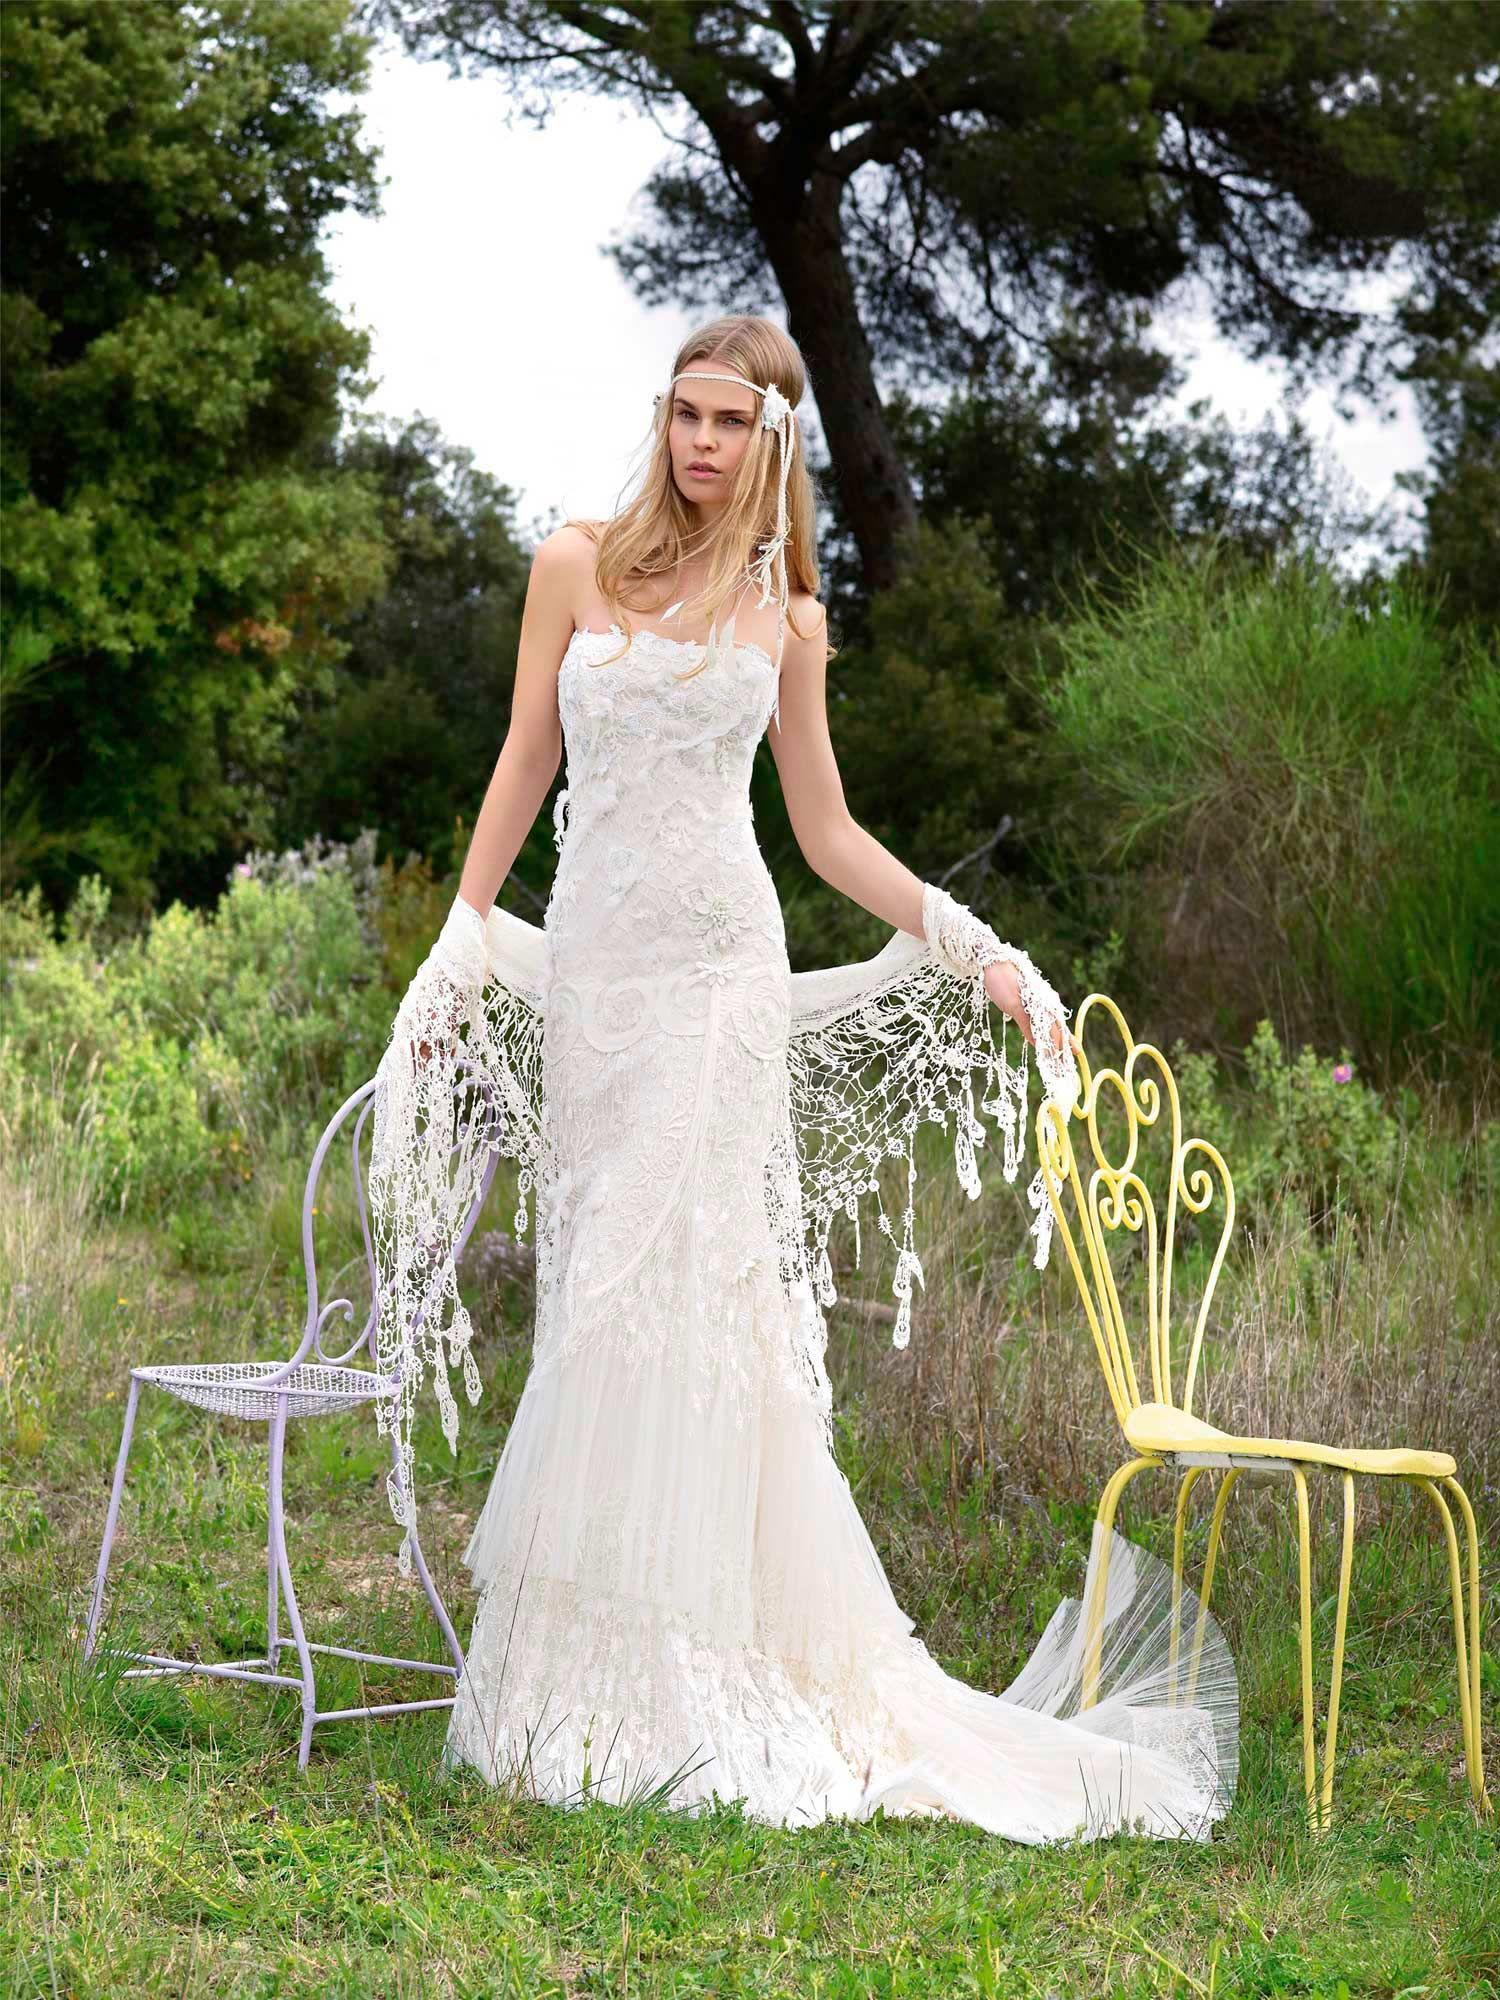 yolancris ibiza style hippie chic wedding dresses la mariee 2 robe mari e boh me chic